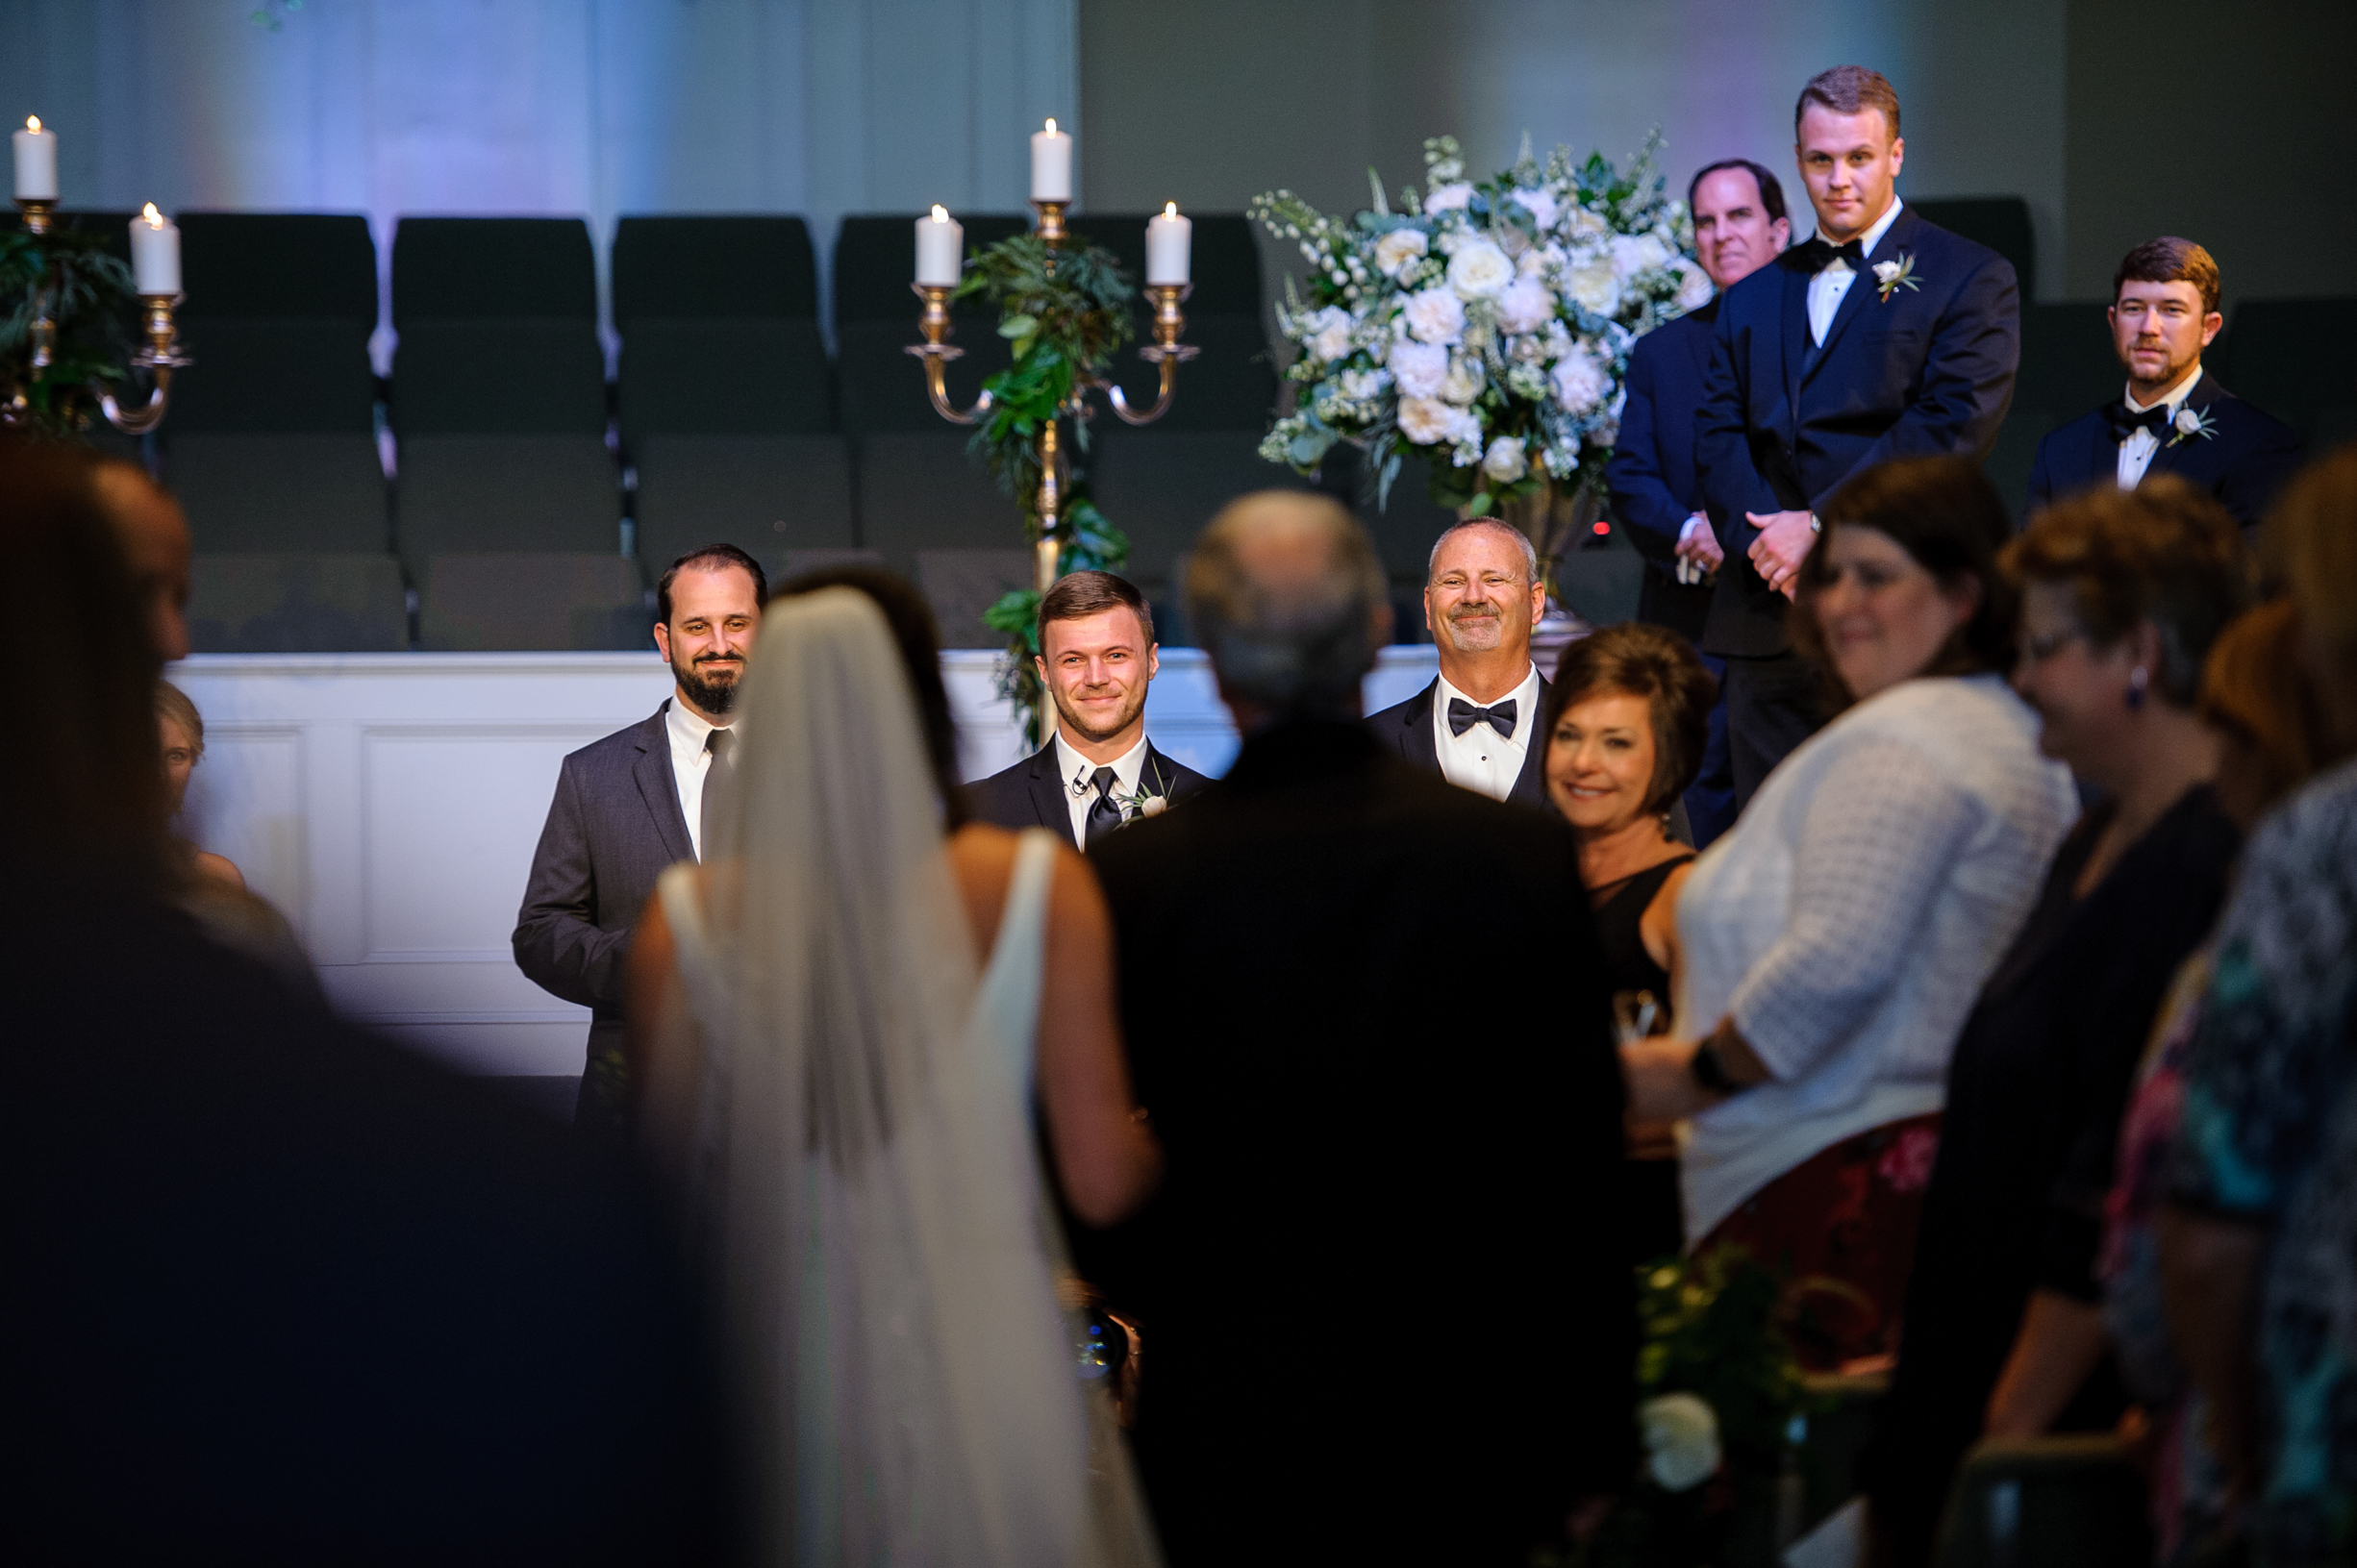 Royal Wedding with Outdoor Reception-37.JPG